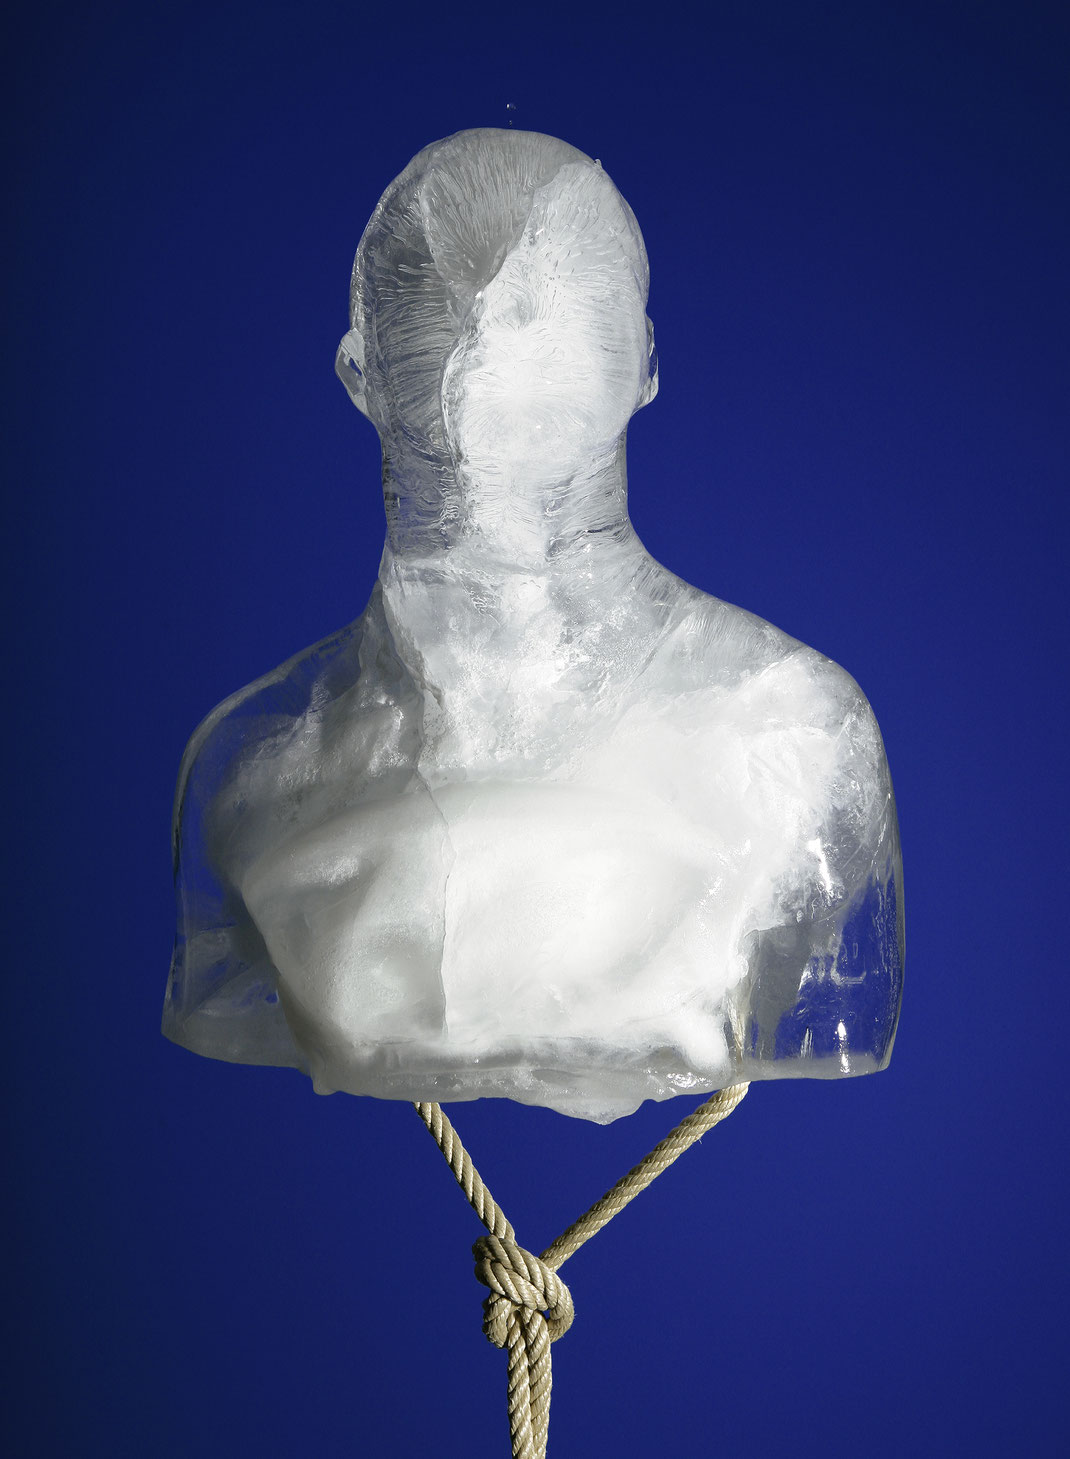 franticek-klossner-portrait-in-eis-skulptur-gegenwartskunst-der-menschliche-koerper-in-der-zeitgenoessischen-kunst